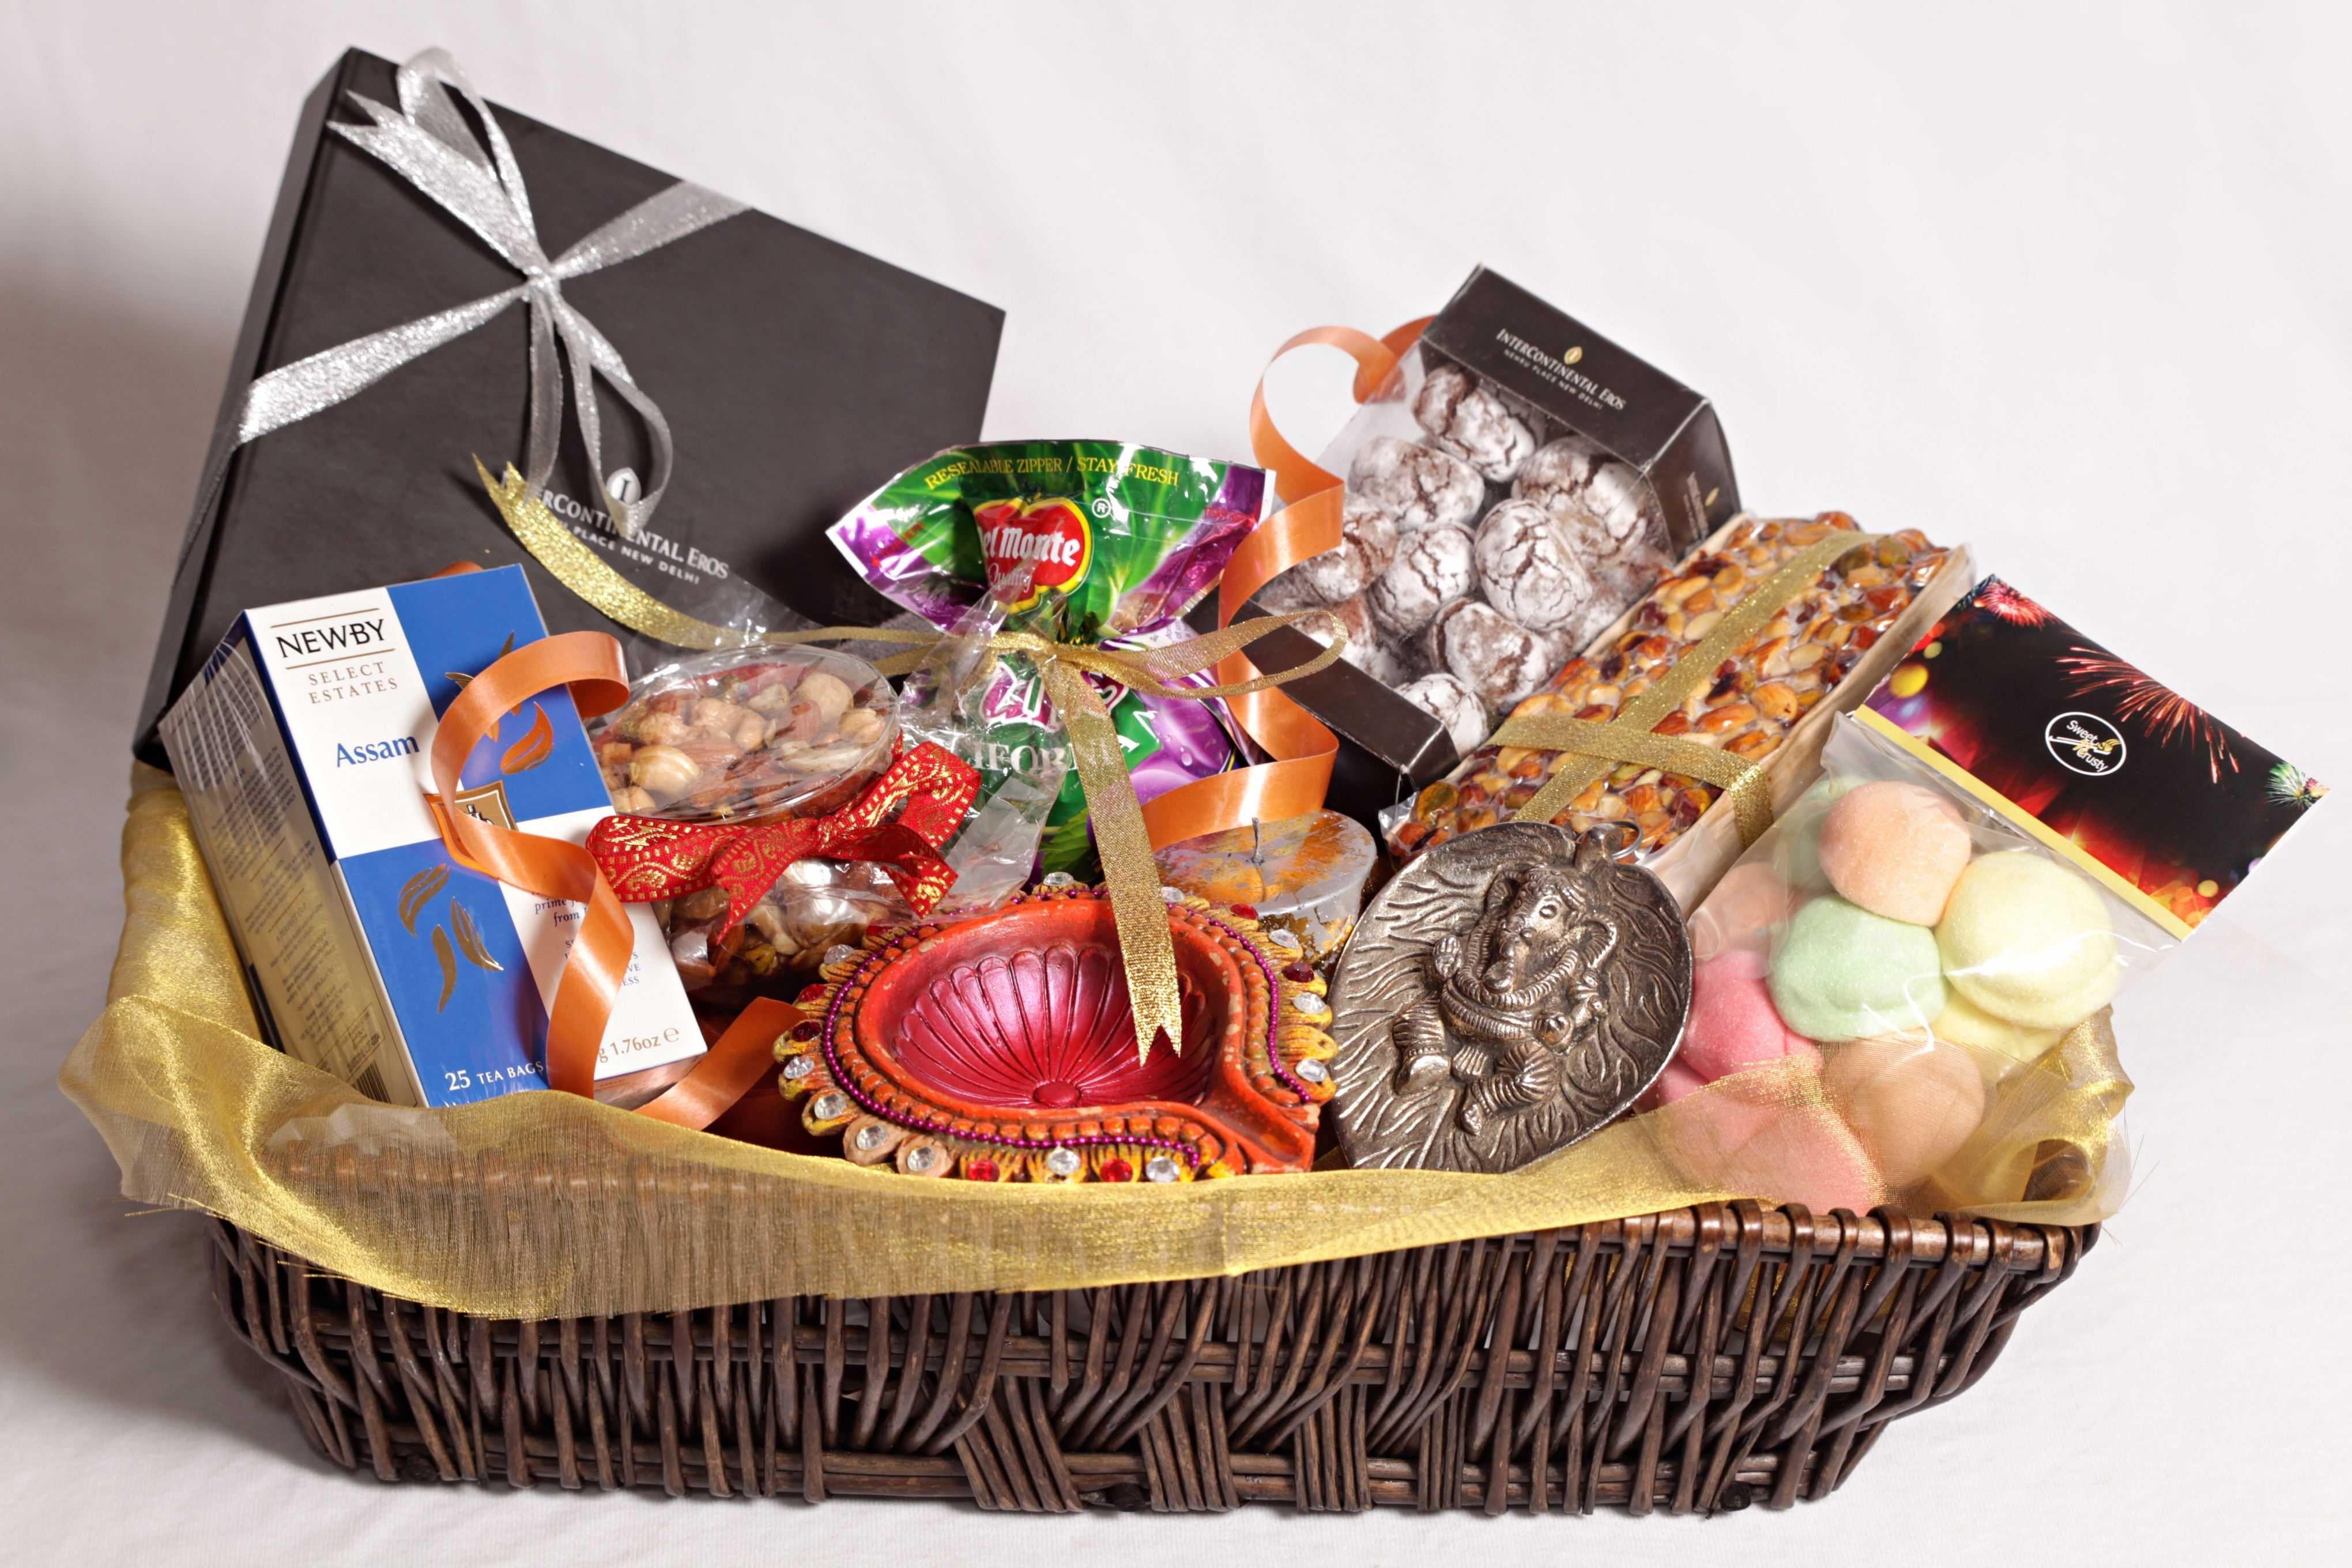 10 Lovable Gift Ideas For Family Members best diwali gift ideas for friends family members diwali 2018